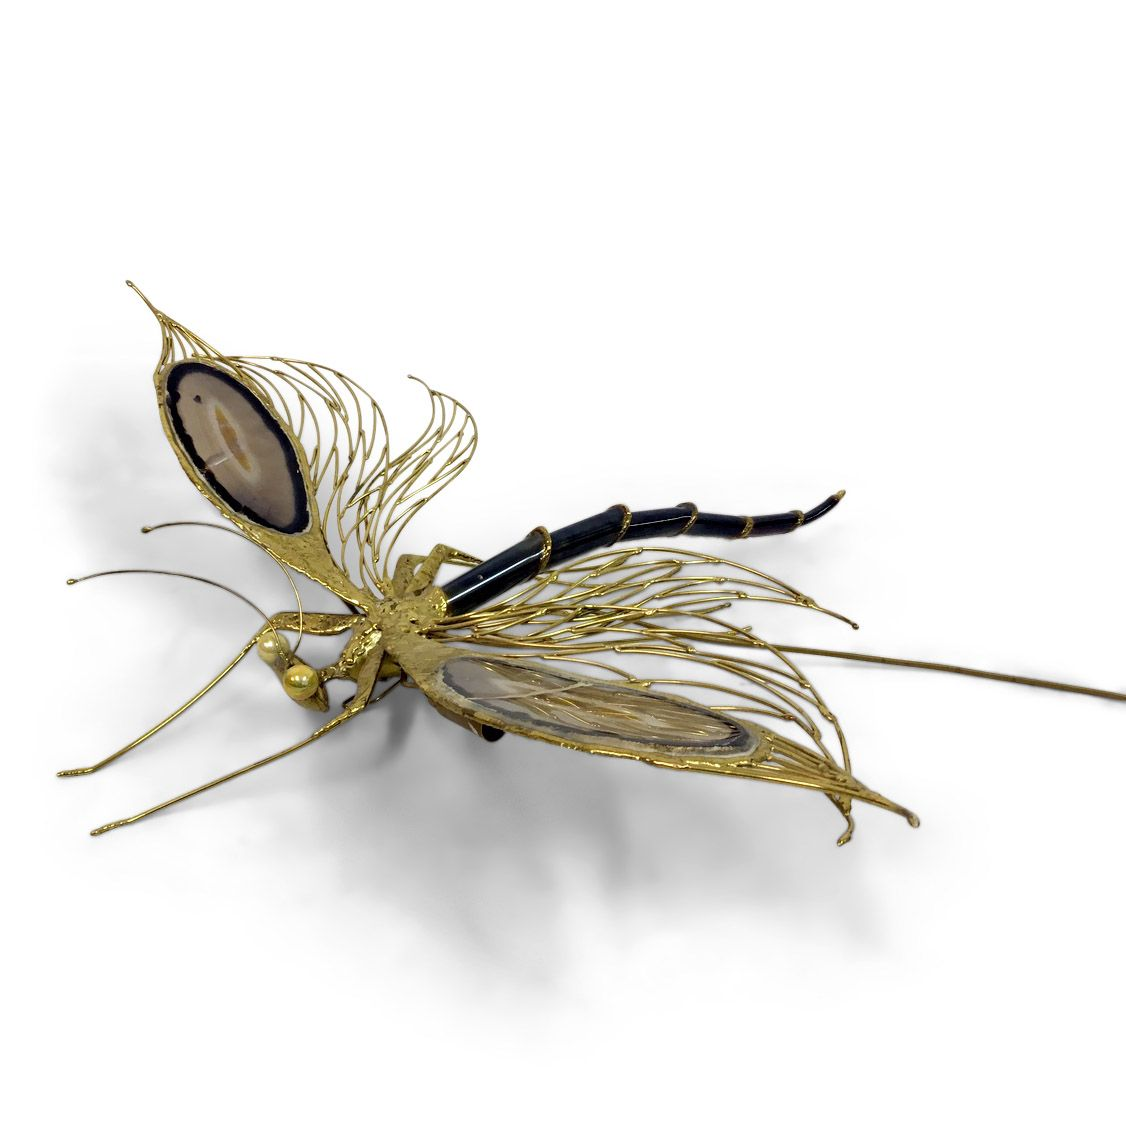 Vintage Lampe aus vergoldetem Messing & Achat in Libellen-Optik